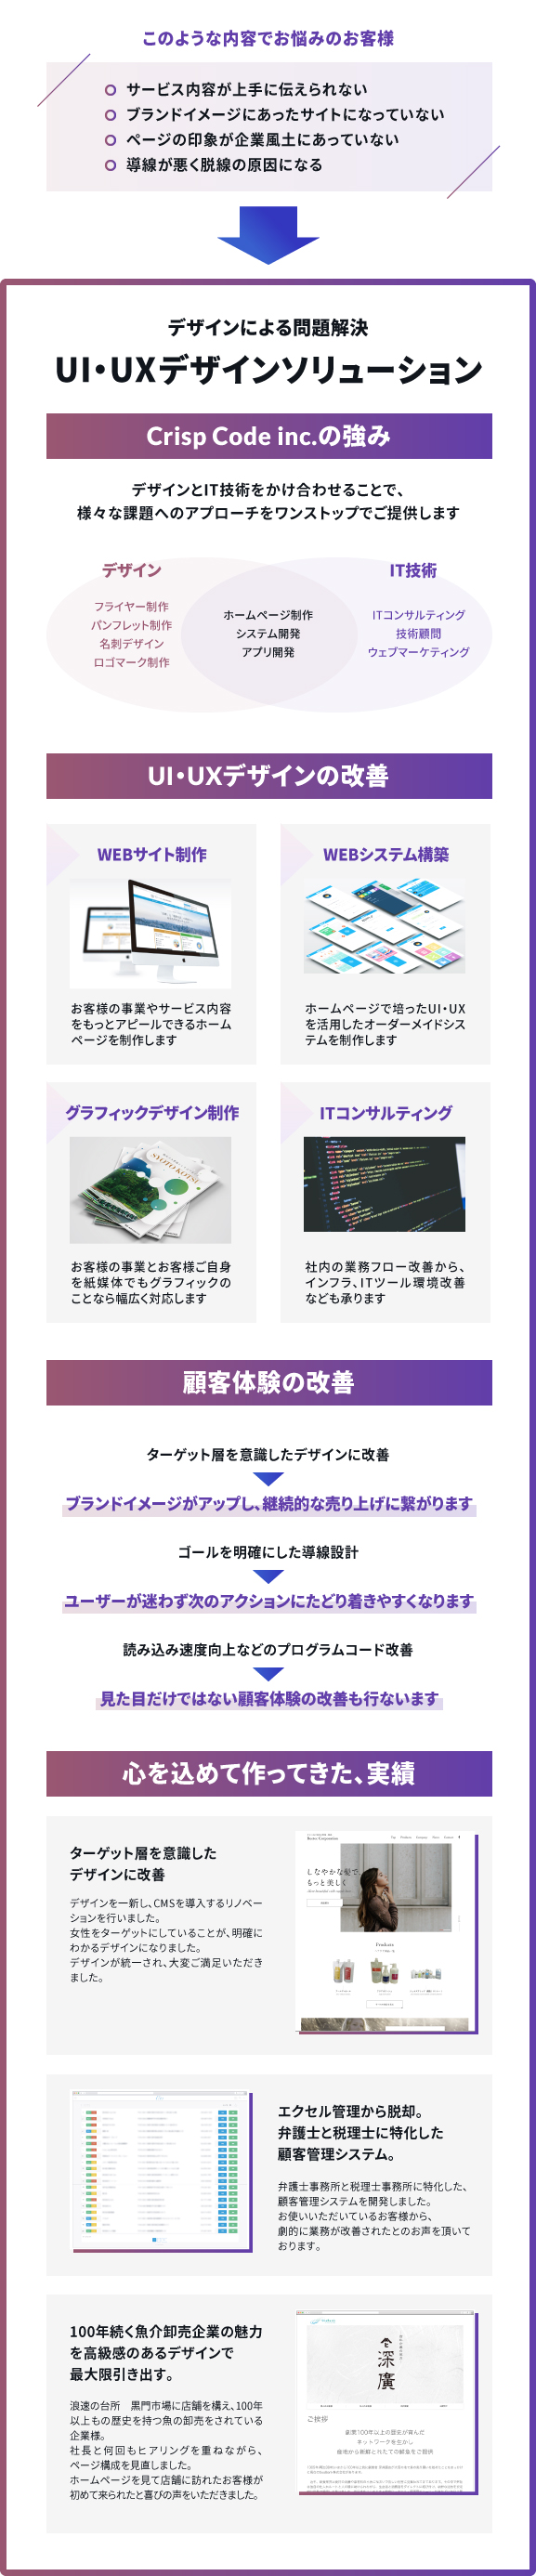 UI・UXデザインソリューション